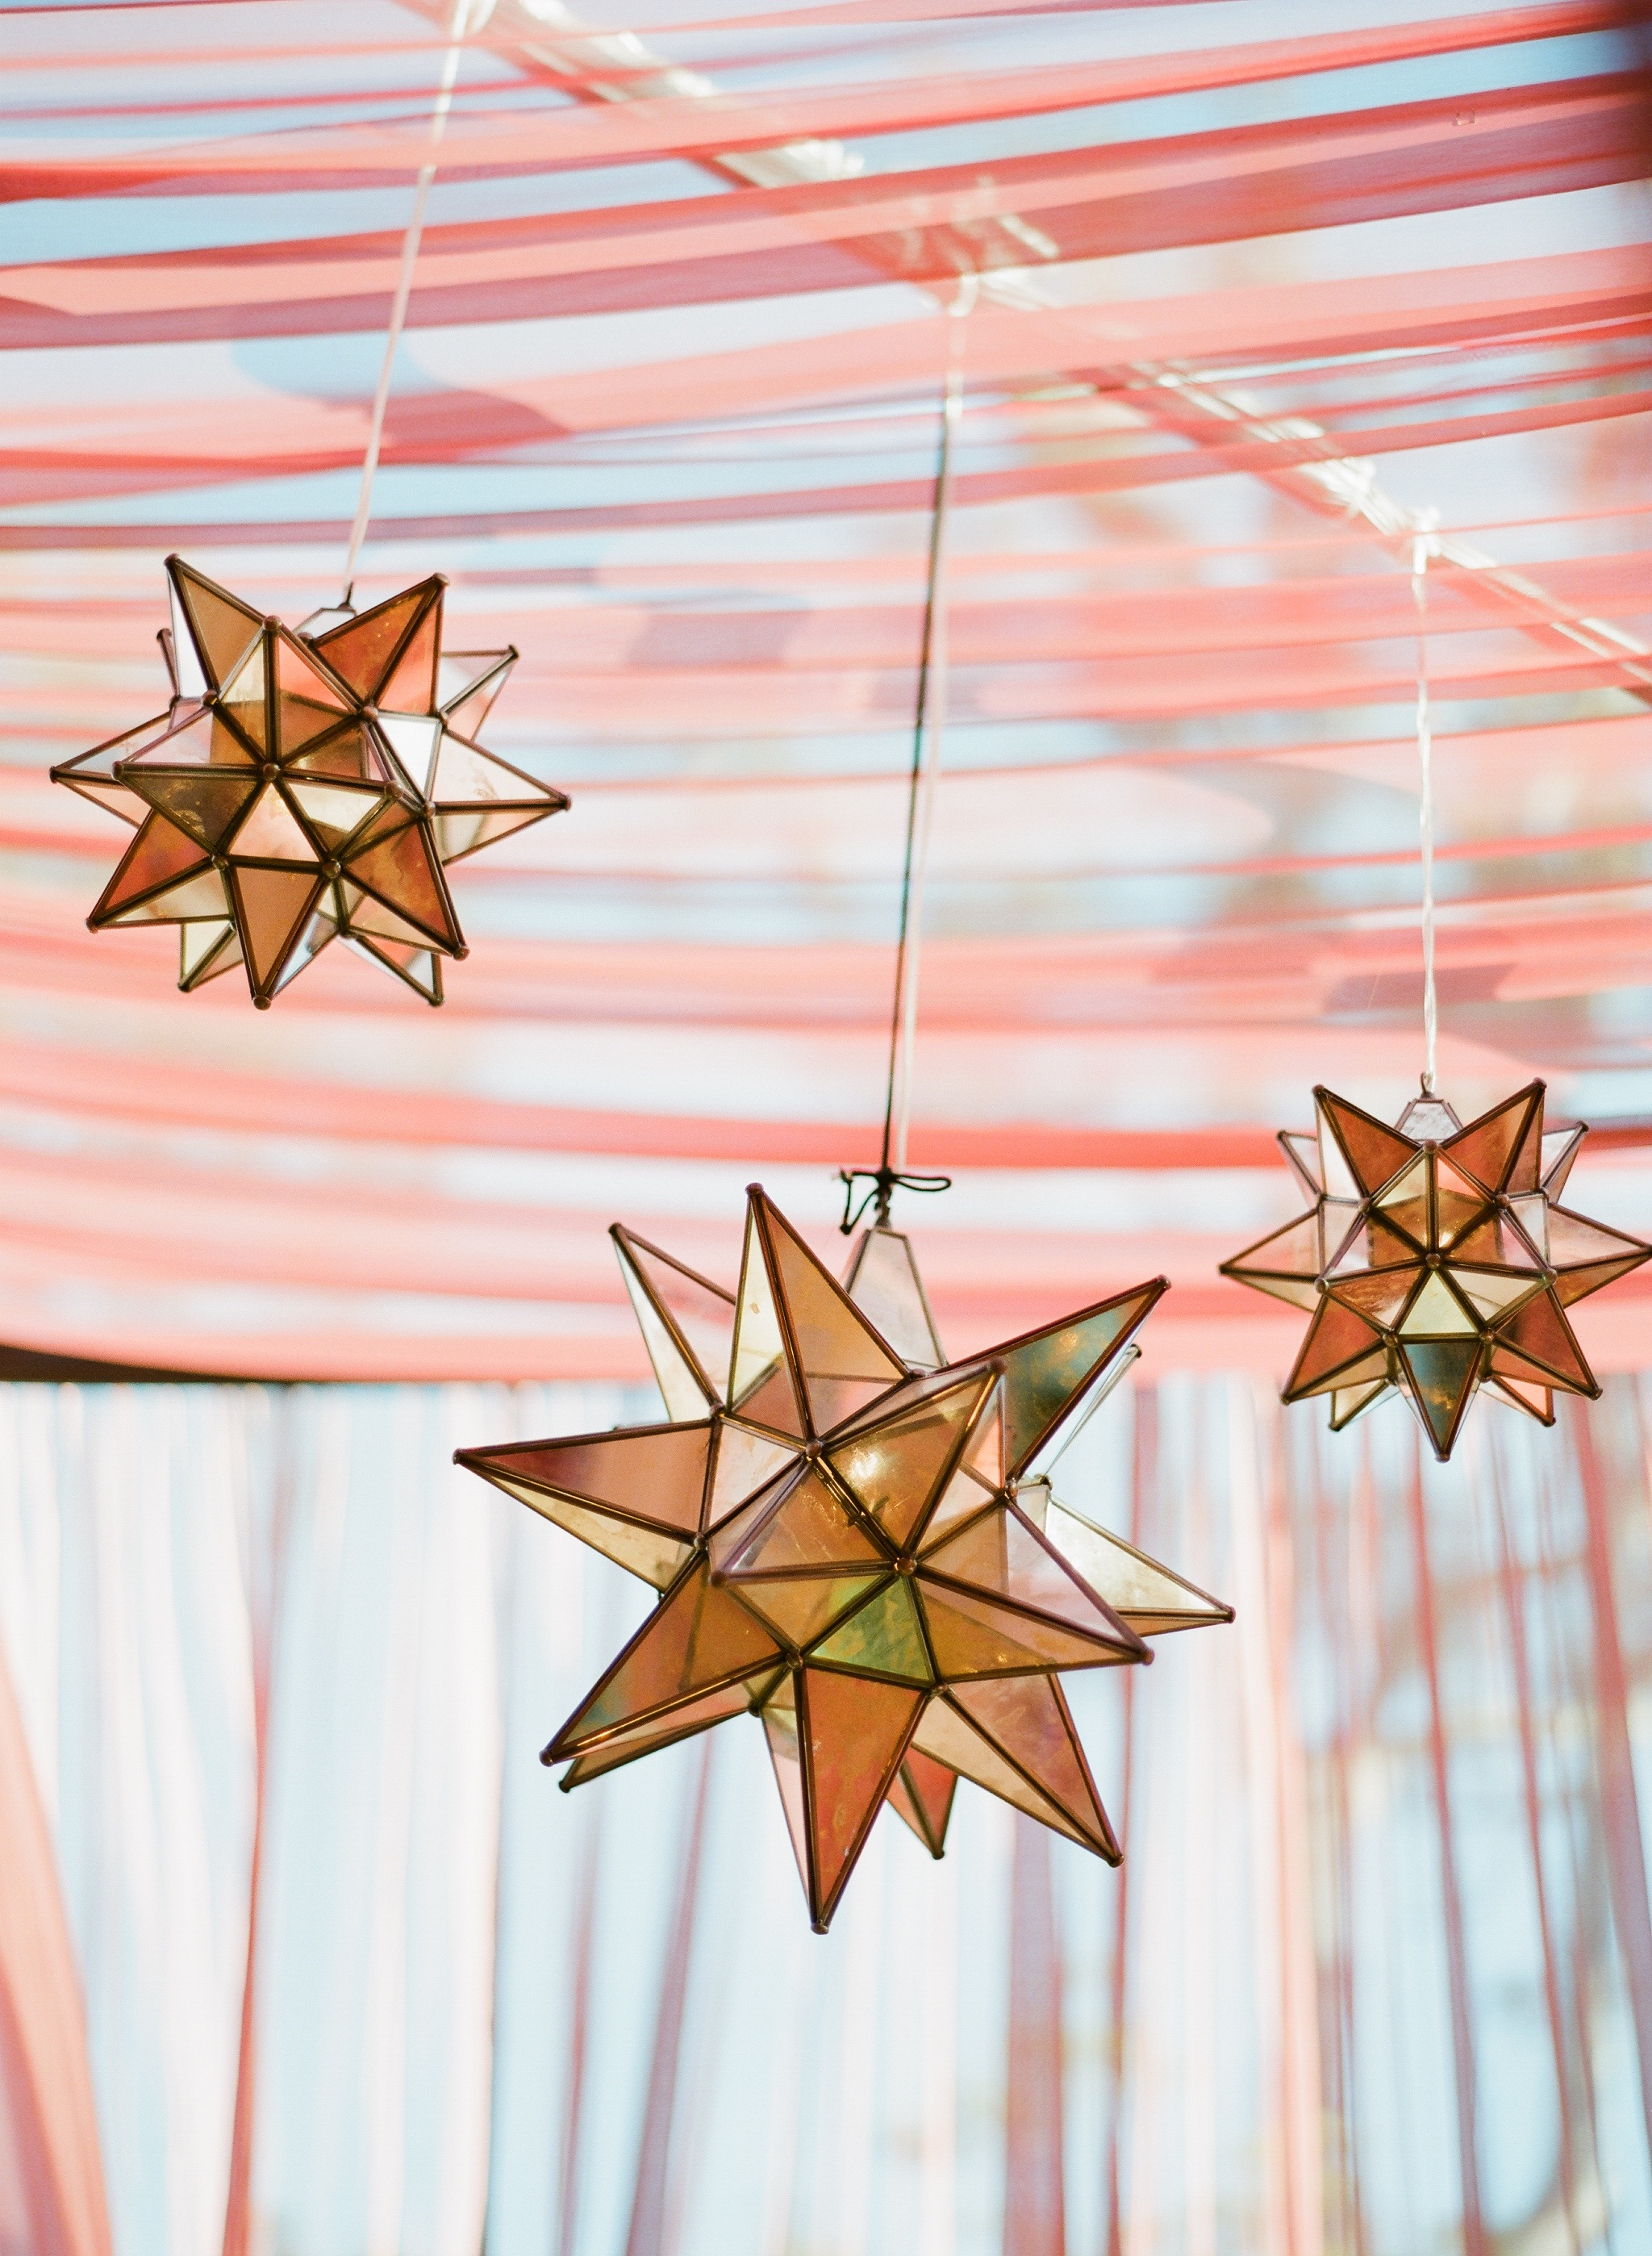 santabarbarawedding.com | Belmond El Encanto | Magnolia Event Design | Jose Villa | Wedding Lighting